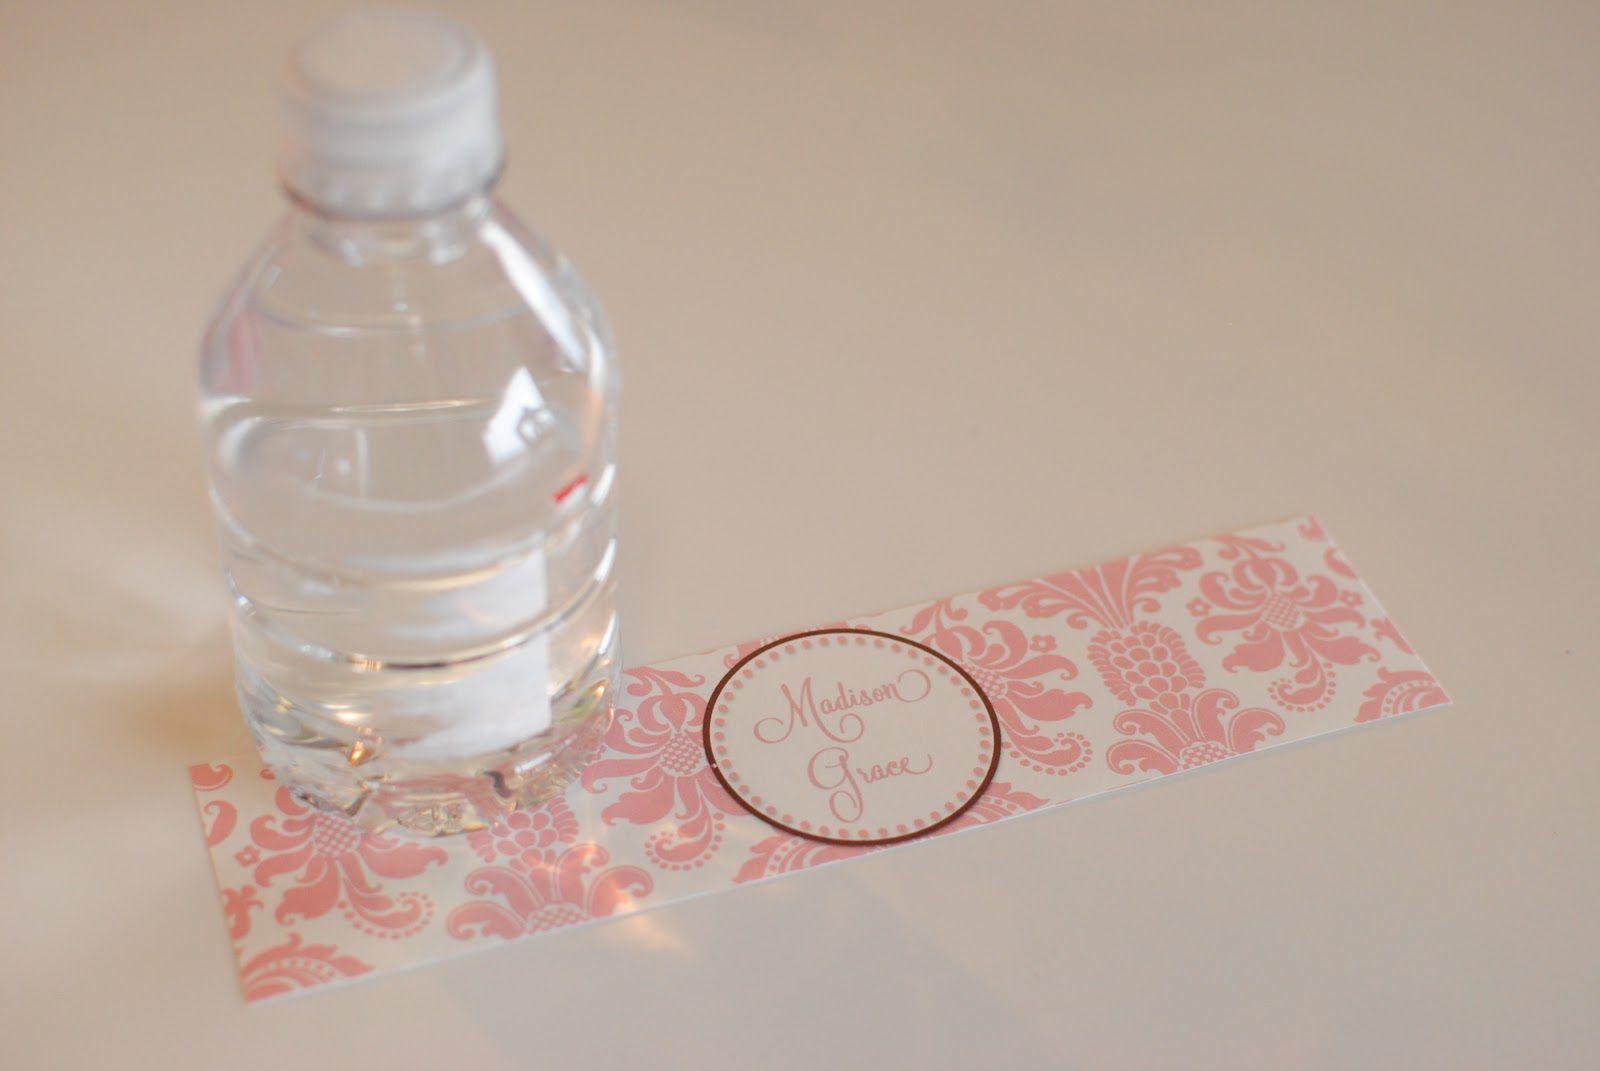 004 Breathtaking Diy Water Bottle Label Template Free High Def Full